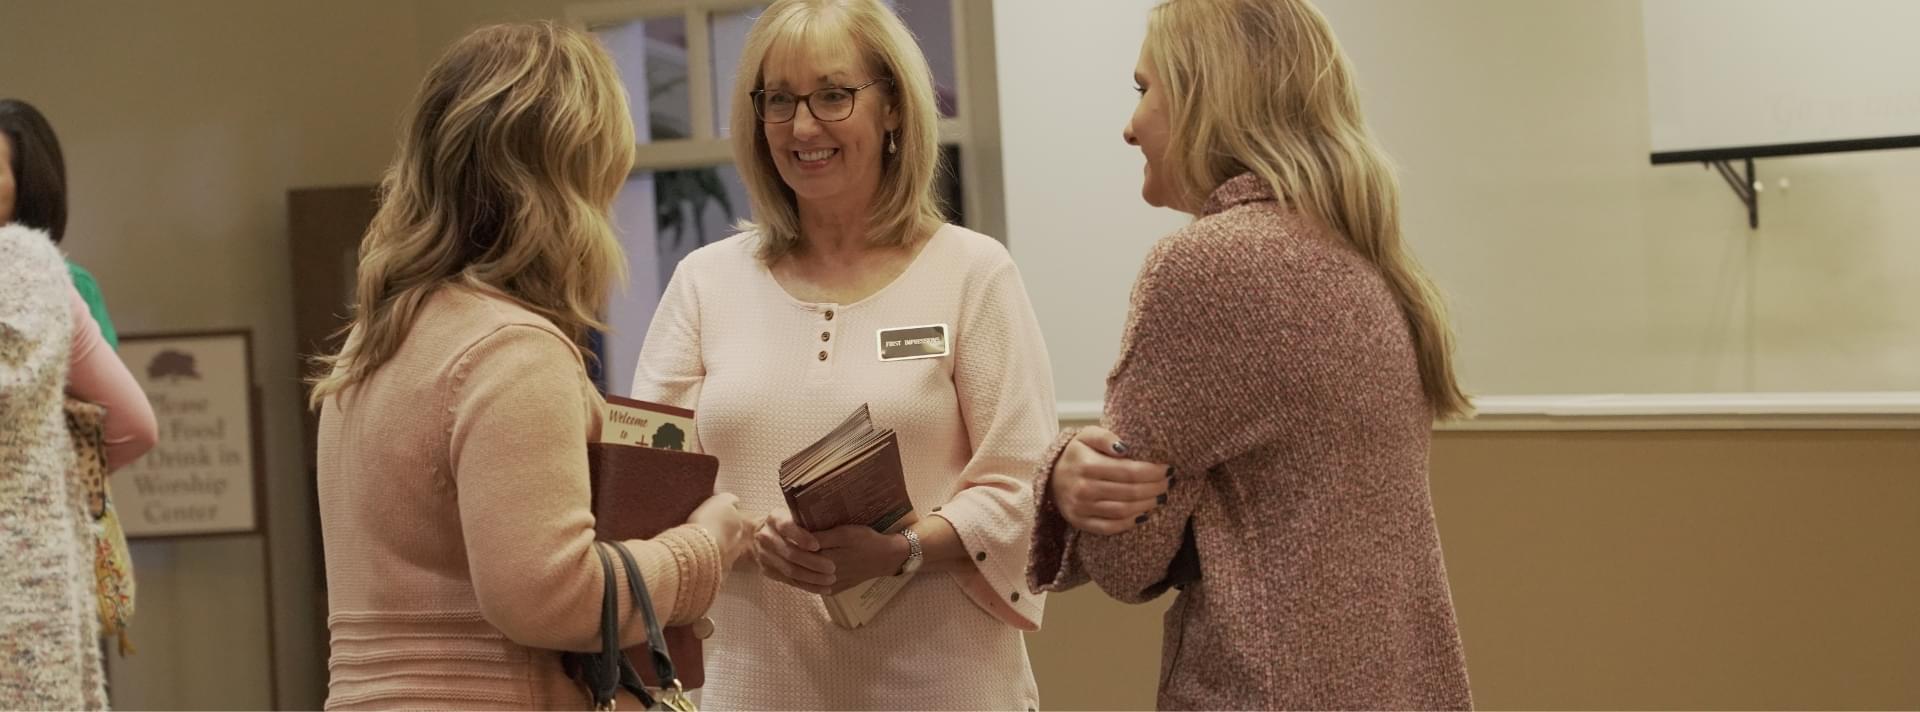 Glen Haven Women's Ministry